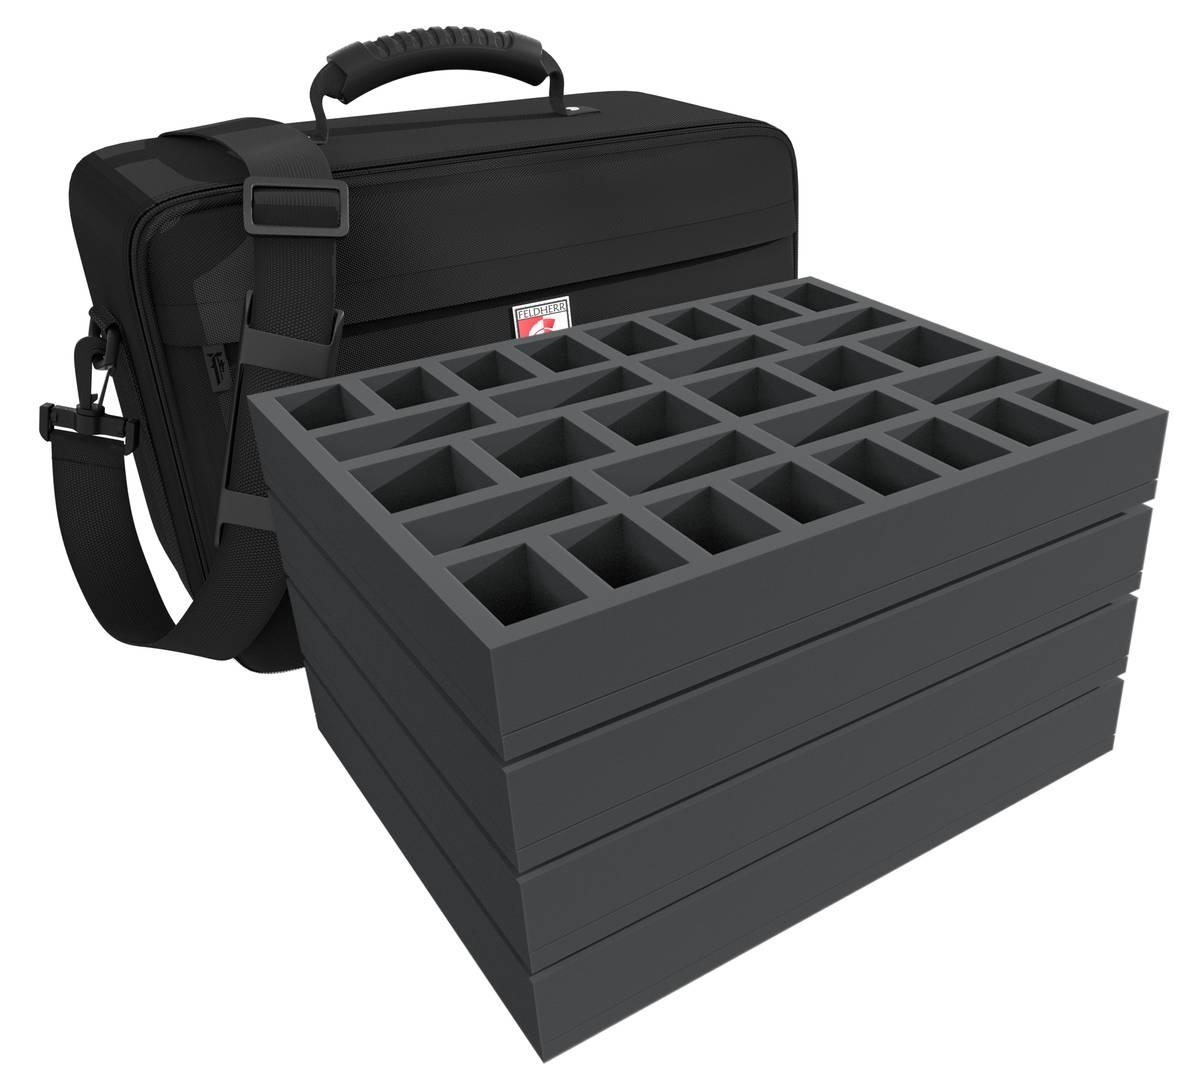 Feldherr MAXI bag for 124 miniatures on large base